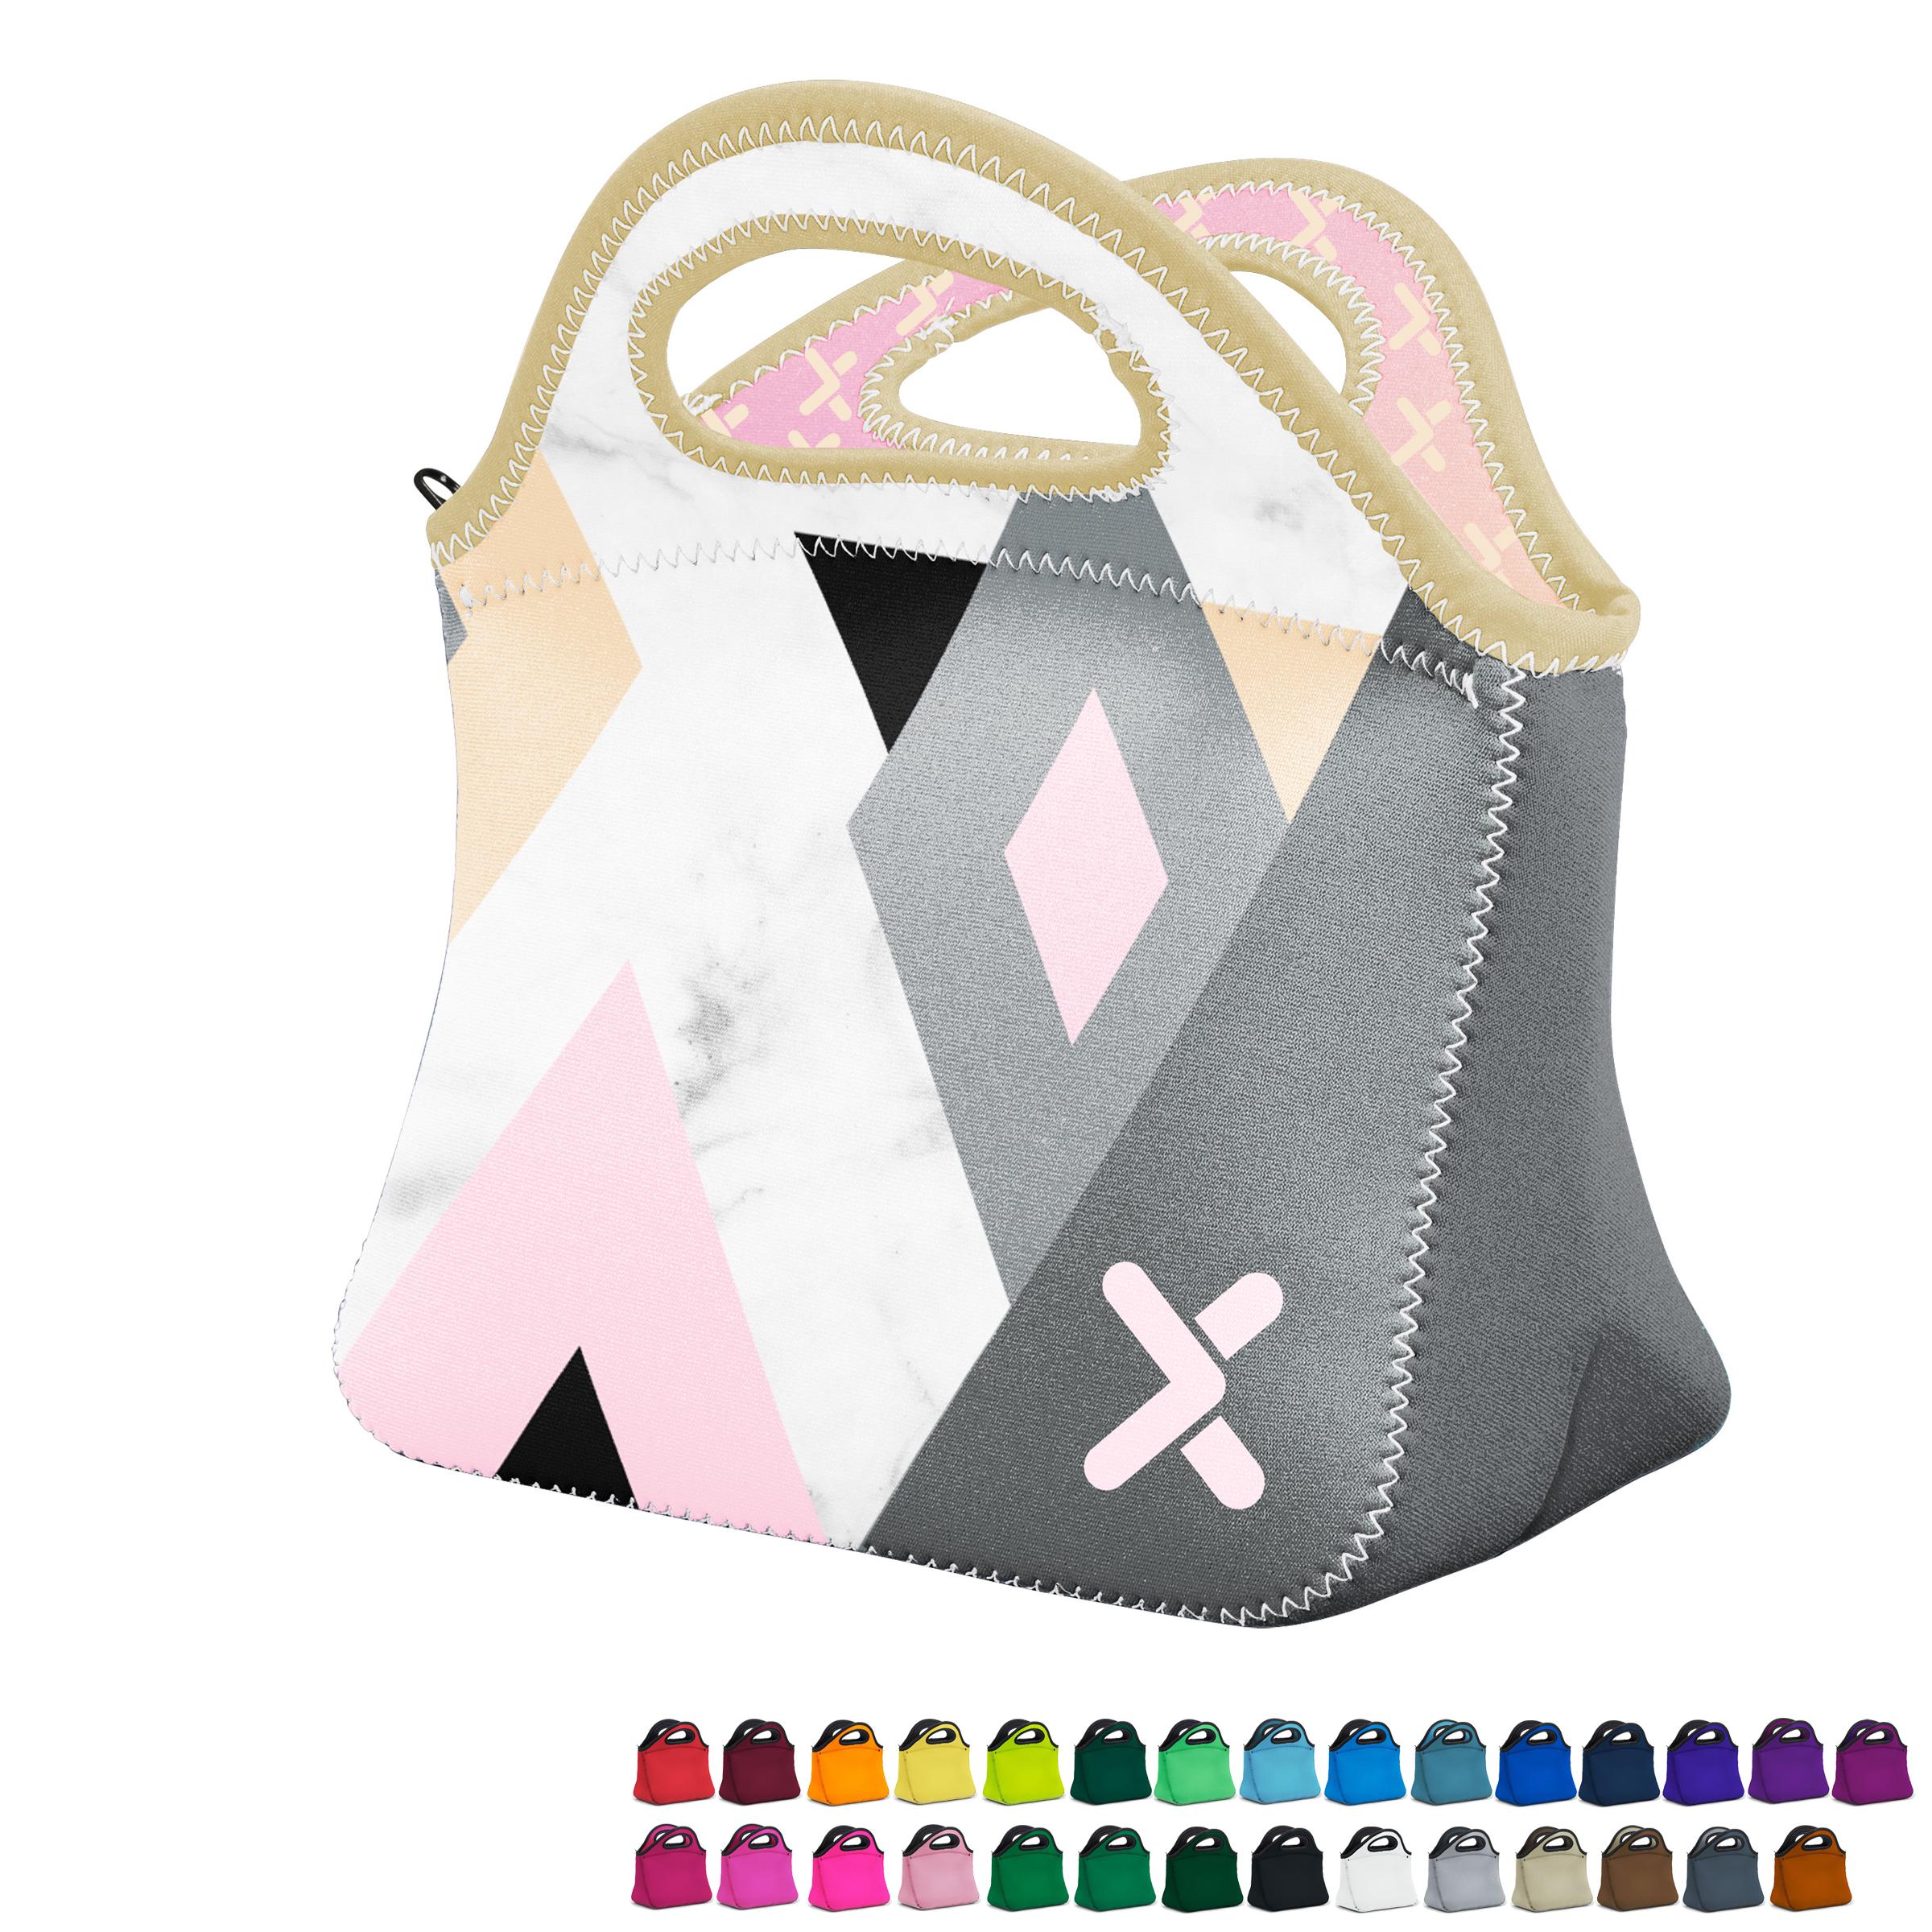 Klutch Duplex Neoprene Lunch Bag with Full Color Imprint